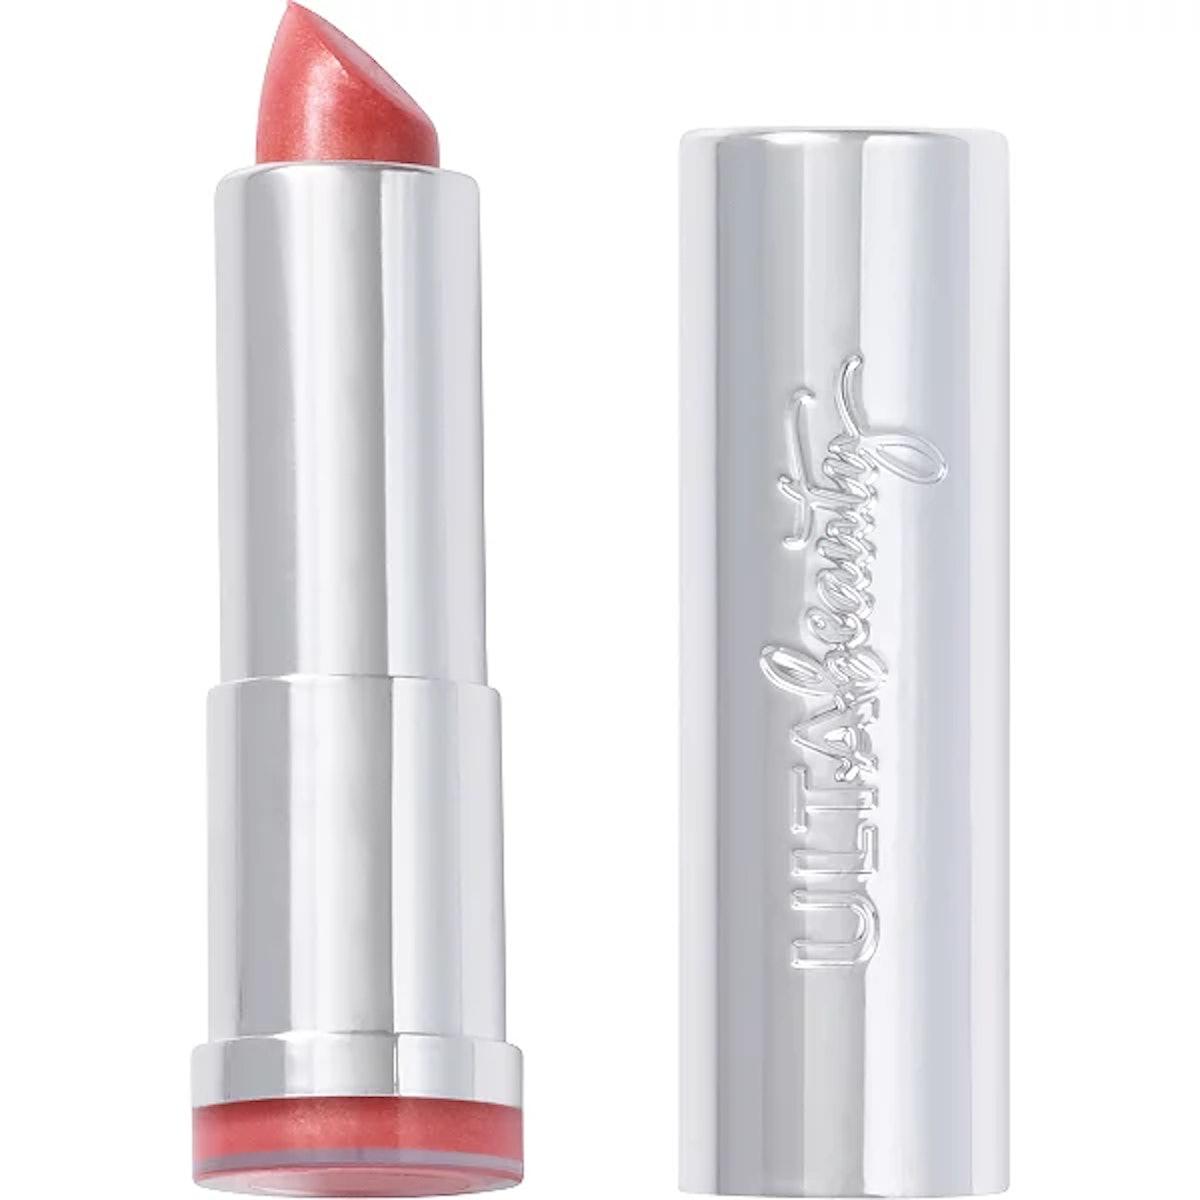 Ulta's Sheer Lipstick